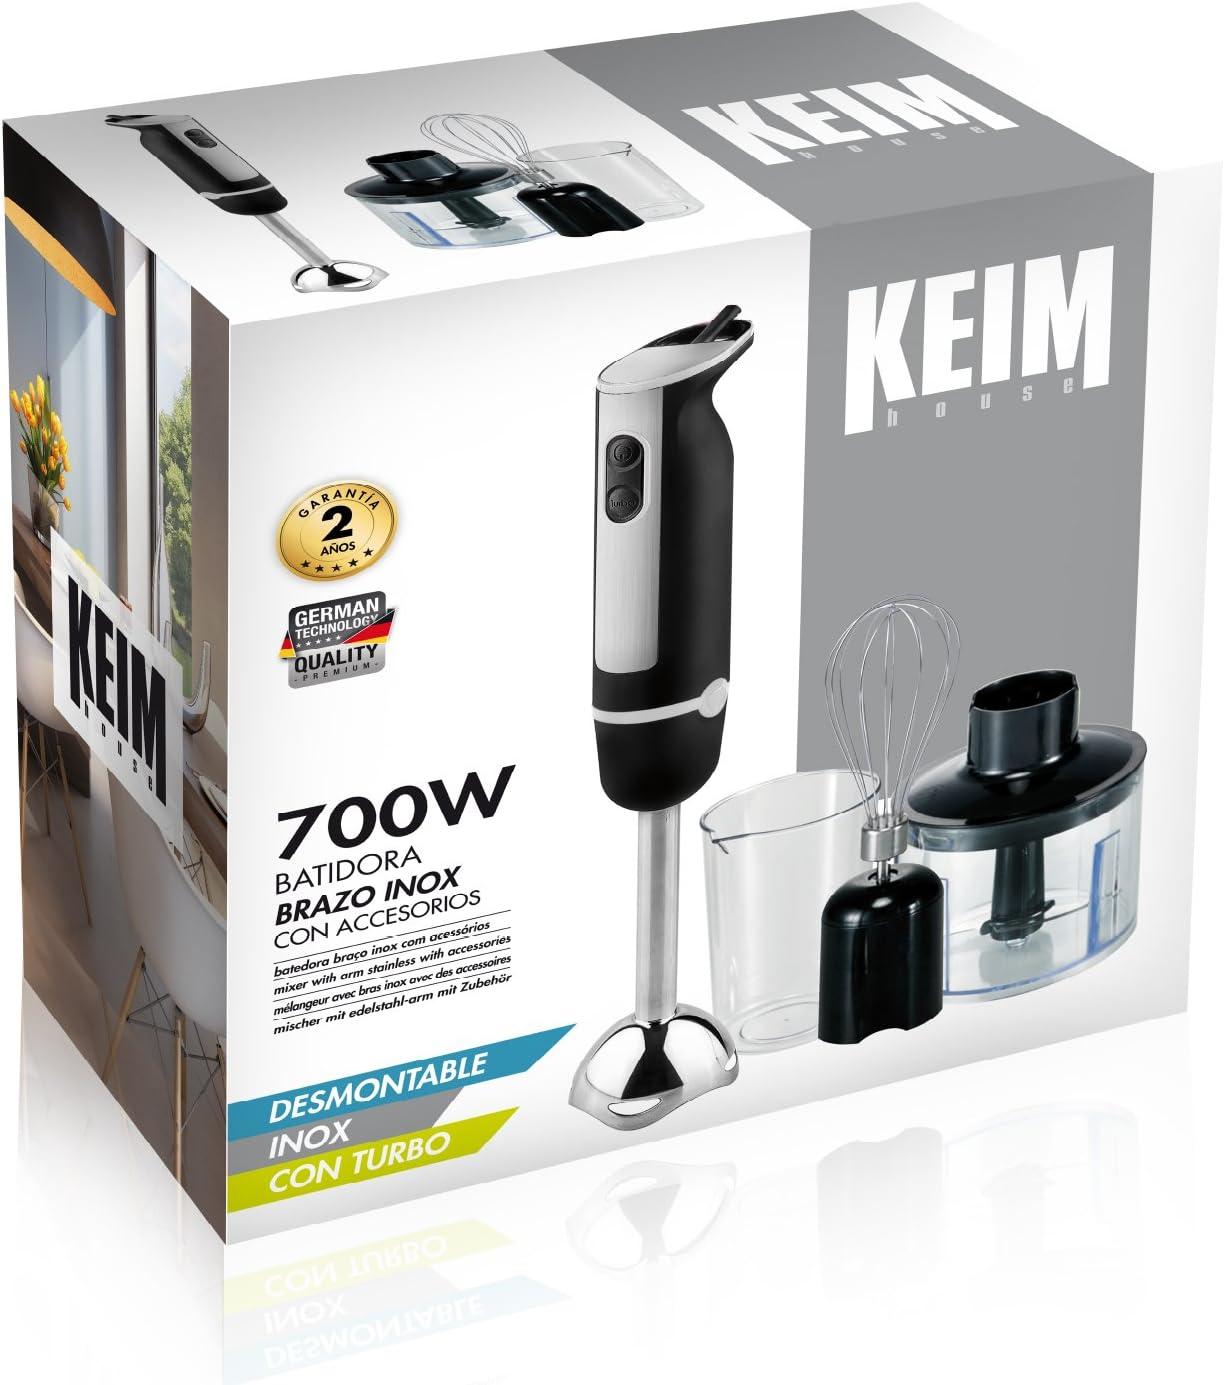 Keim House 33661 Batidora con brazo inox, 700W, 700 W, Blanco y ...